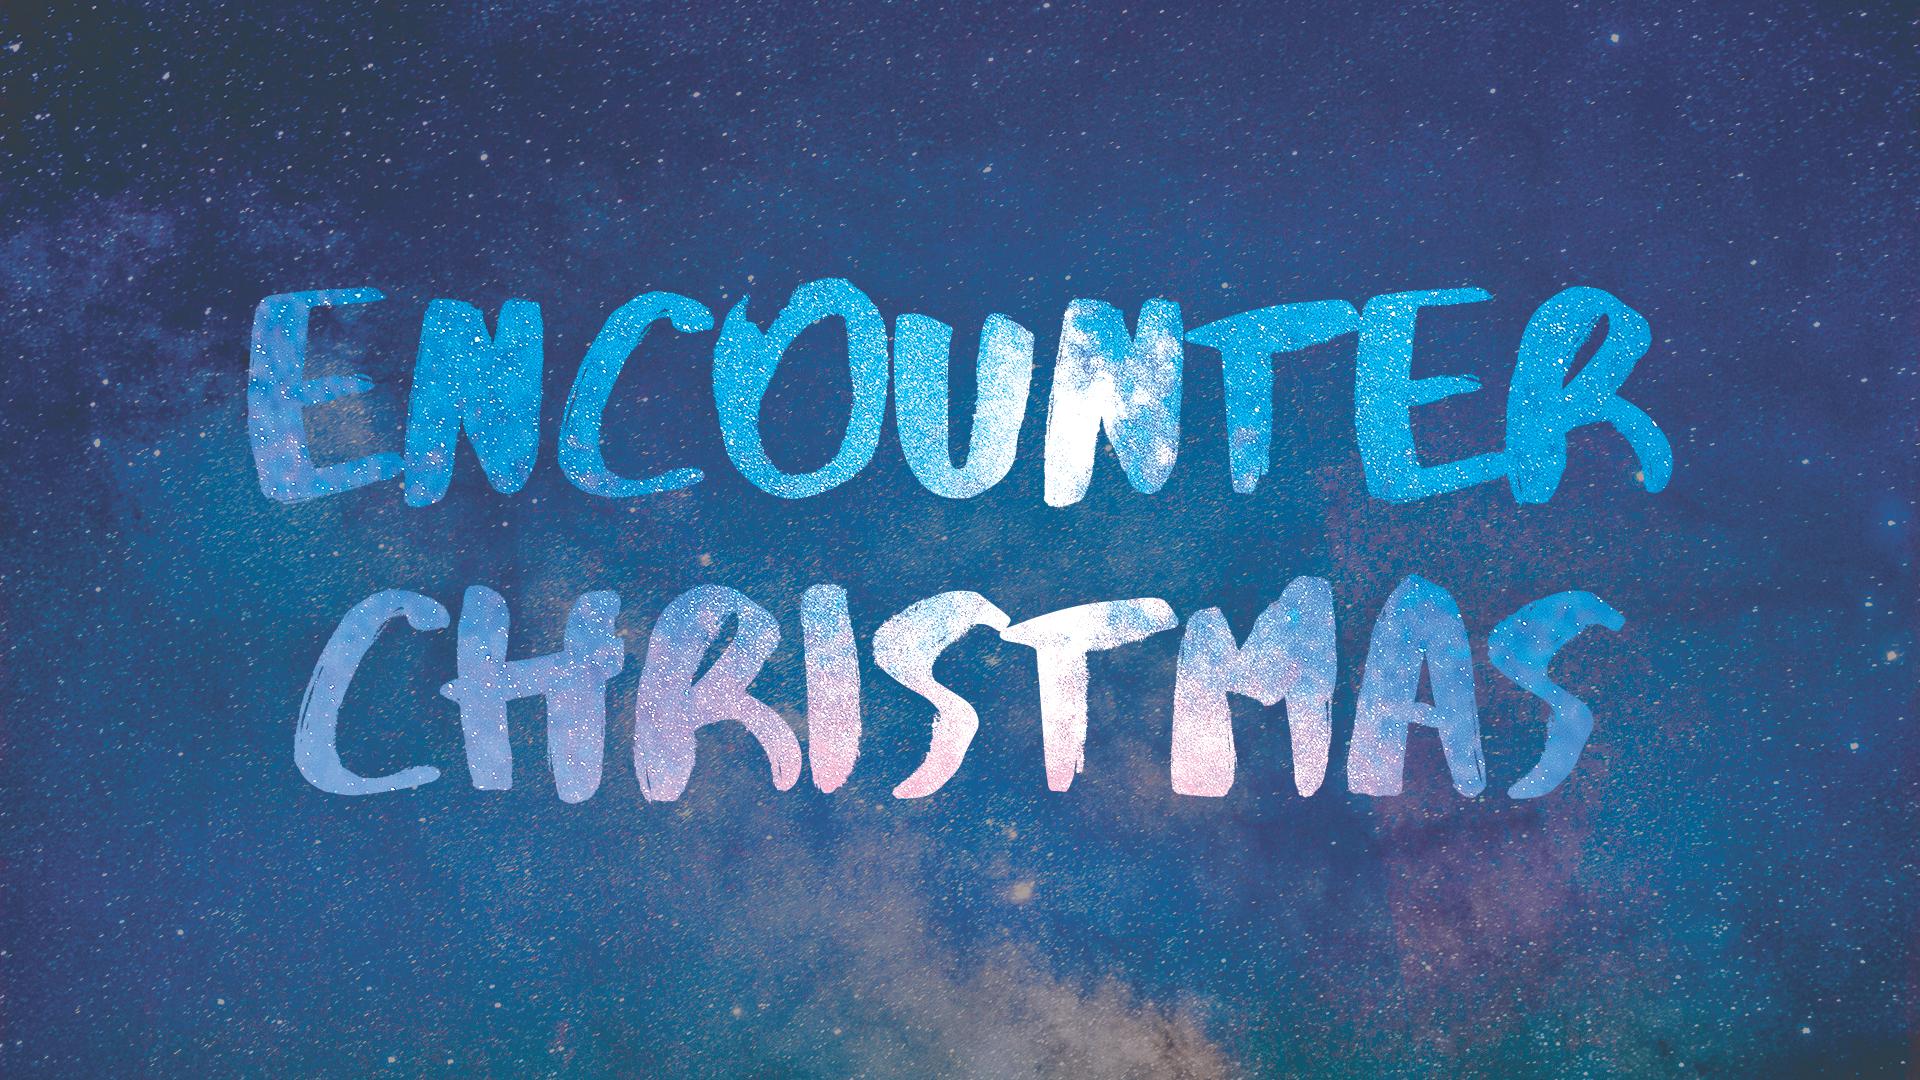 Encounter Christmas_Title 2.JPG